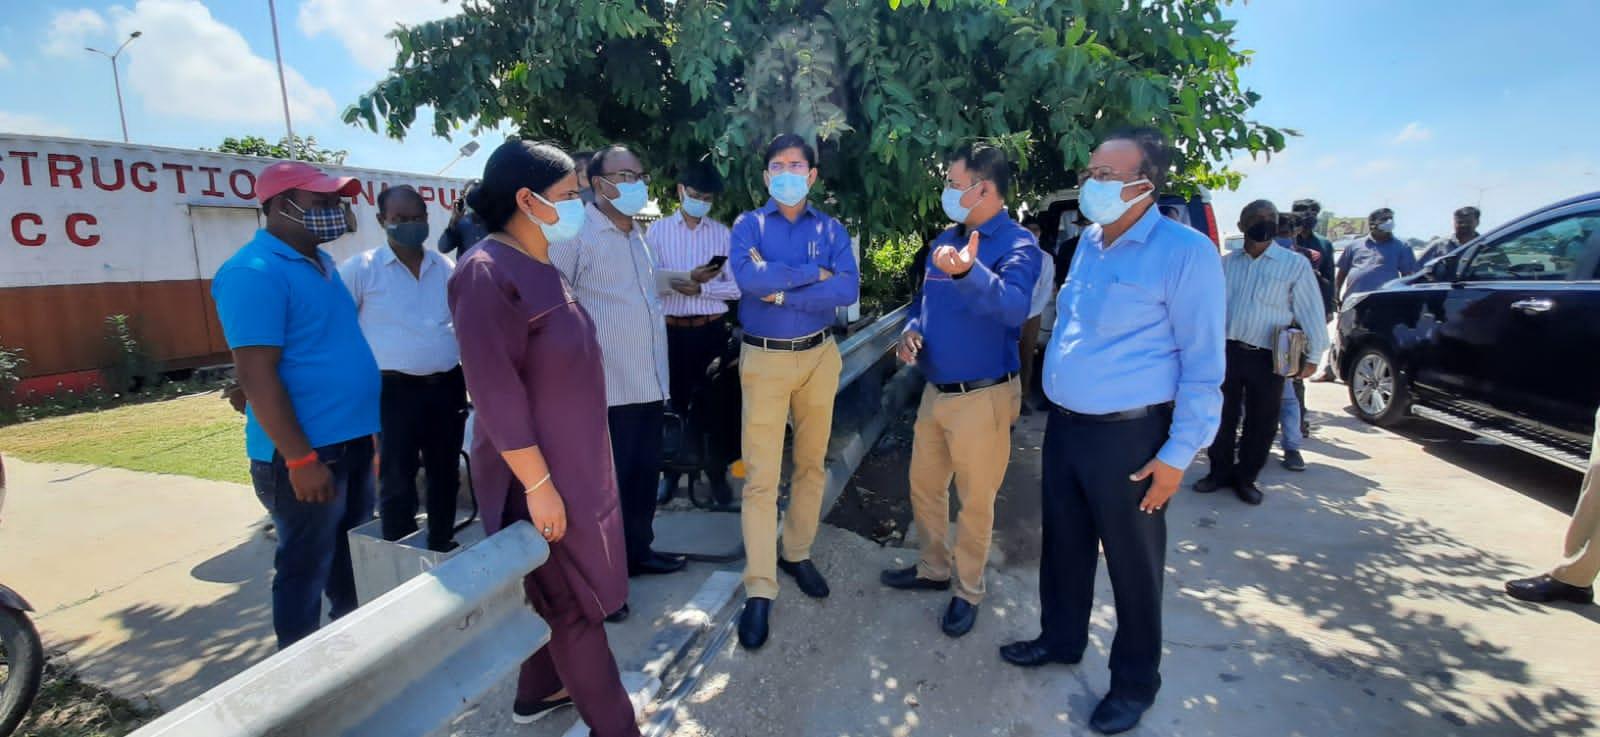 एत्मादपुर रहनकलां का निरीक्षण करती टीम व् अधिकारी